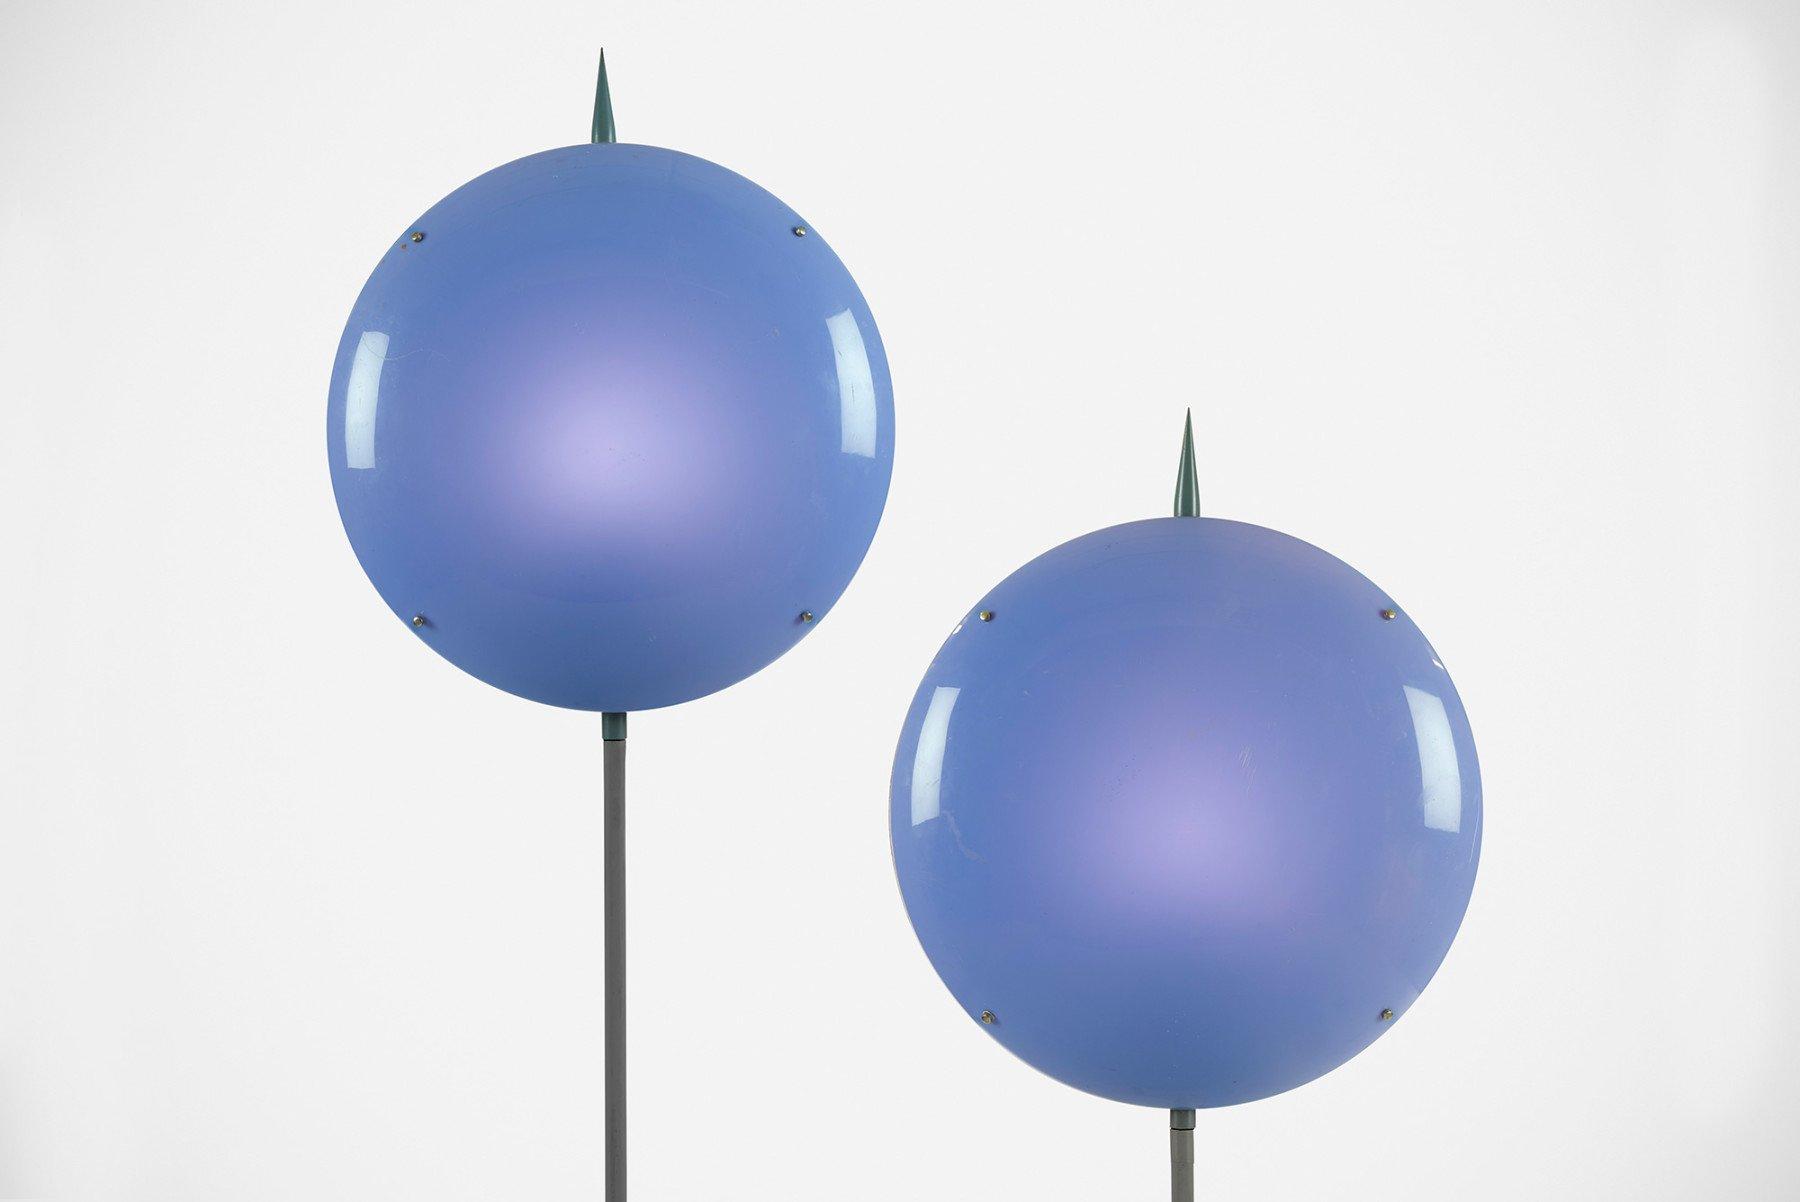 Gio Ponti |  Luna - pair of lamps, from Villa Arreaza, Caracas